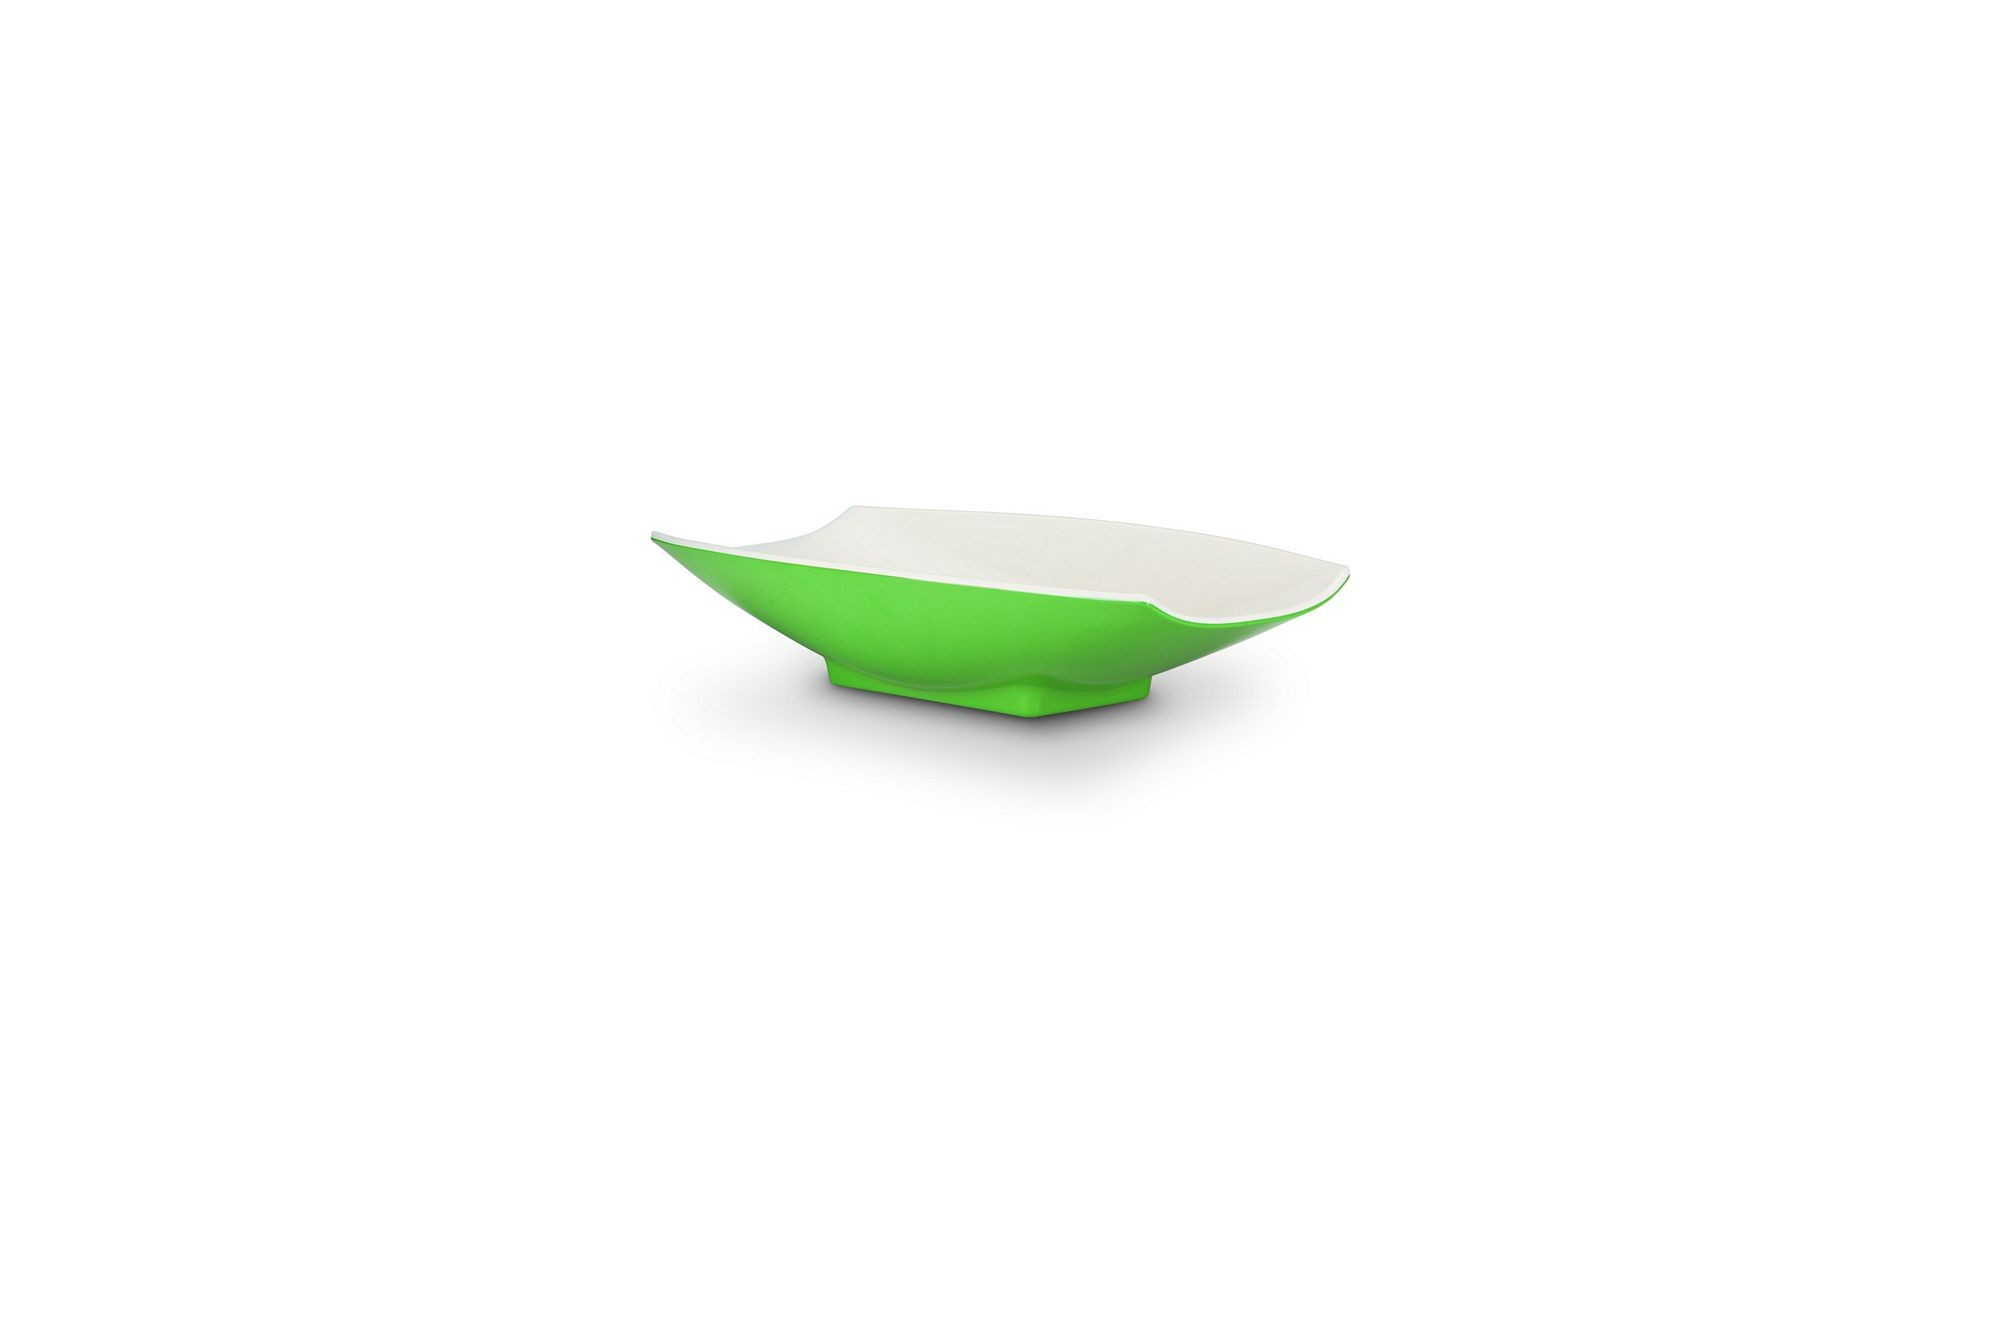 Bon Chef 53701-2ToneLime Melamine Curves Bowl, Lime Outside/White Inside 8 oz.